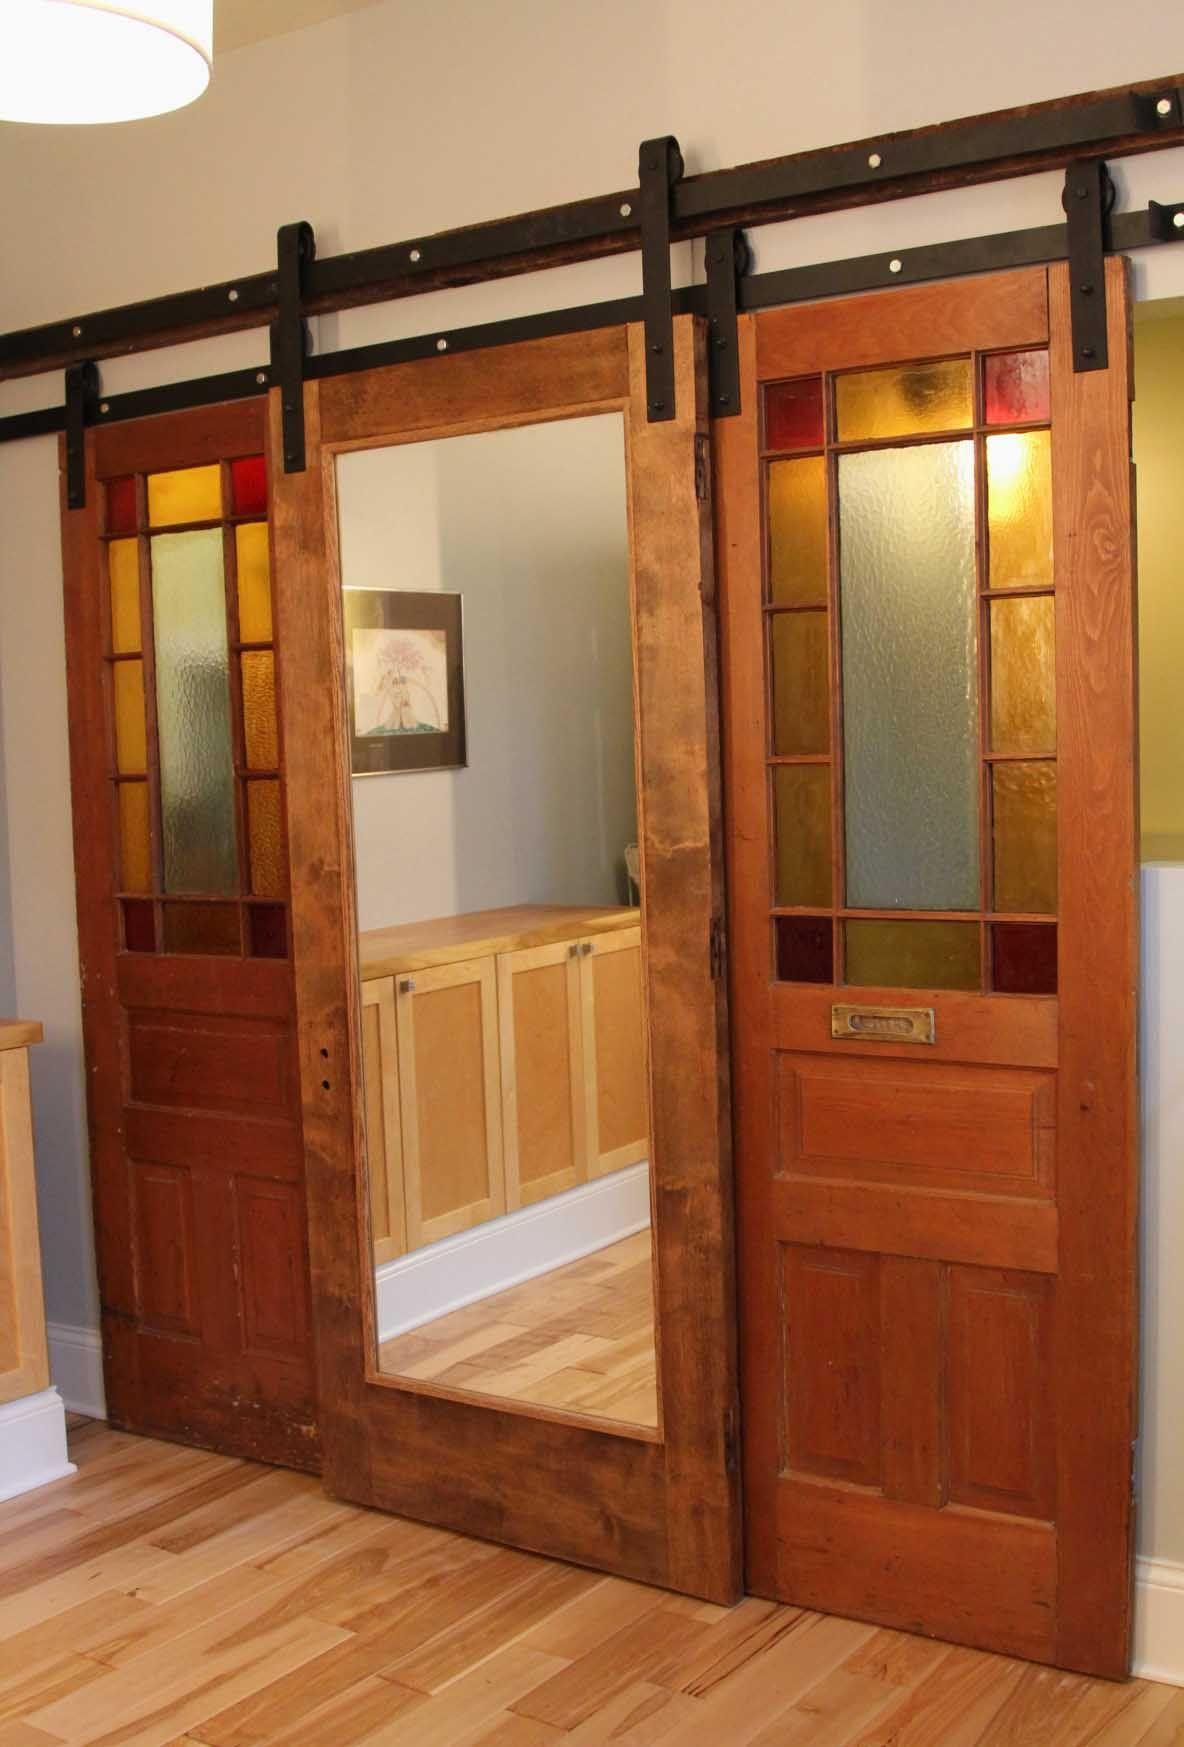 20 Must See Closet Door Ideas With Pictures Archlux Net Barn Style Doors Double Sliding Barn Doors Barn Doors Sliding